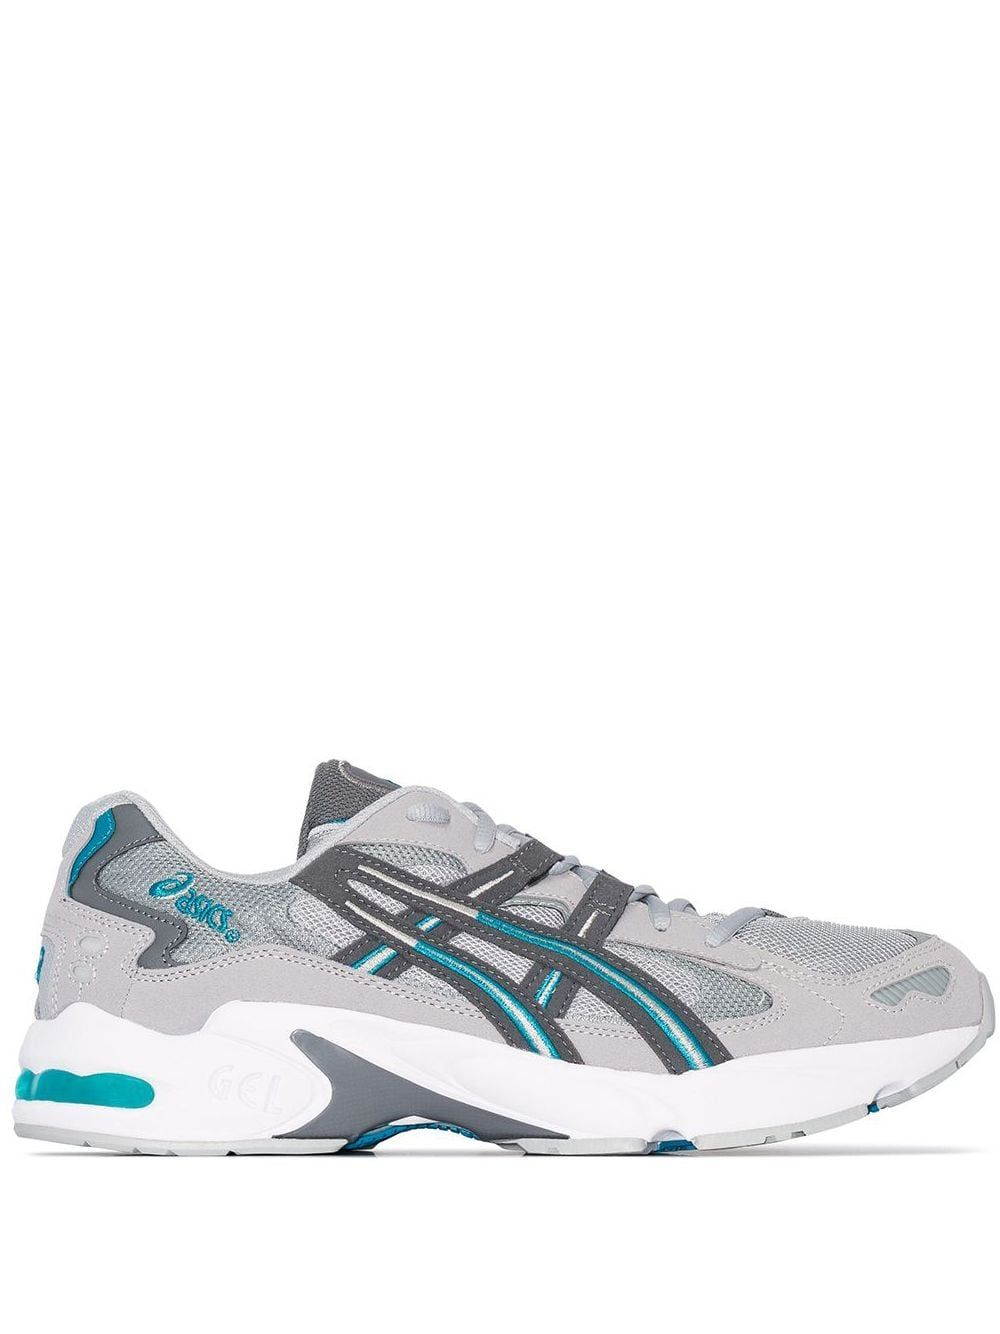 Asics Gel Kayano 5 Sneakers Asics Running Shoe Brands Sneakers